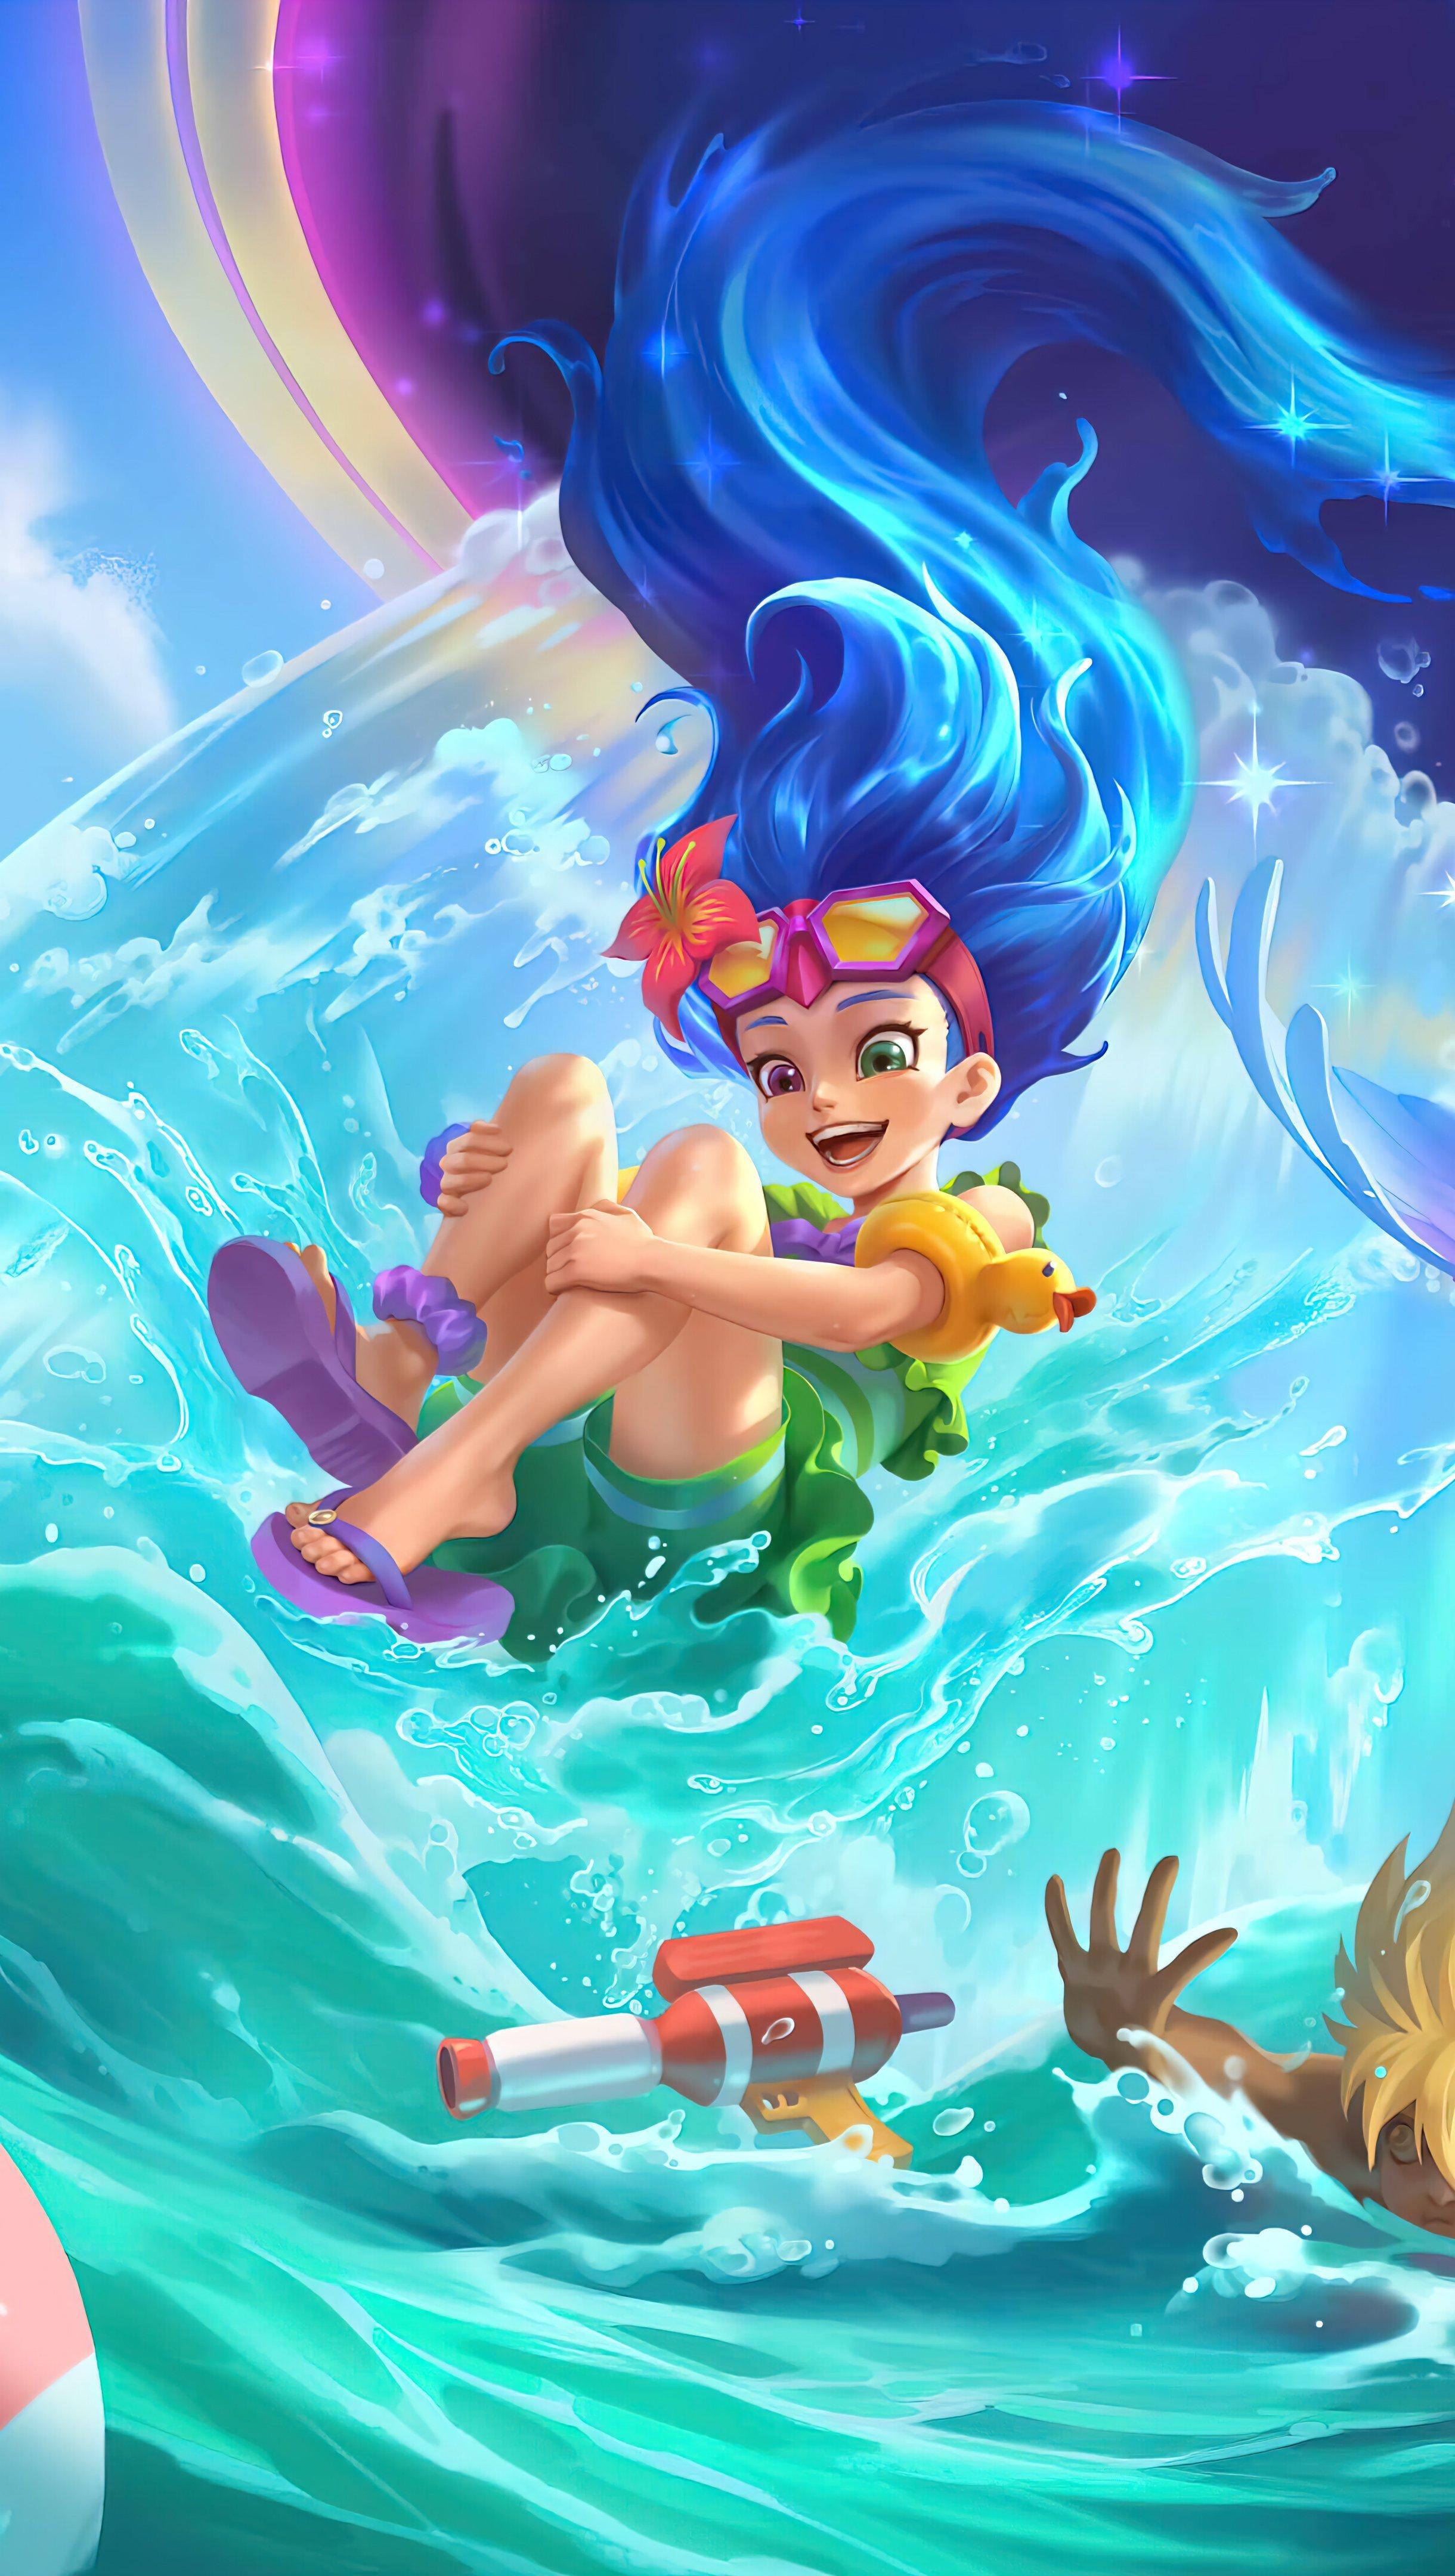 Wallpaper Pool Part Zoe League of Legends Vertical